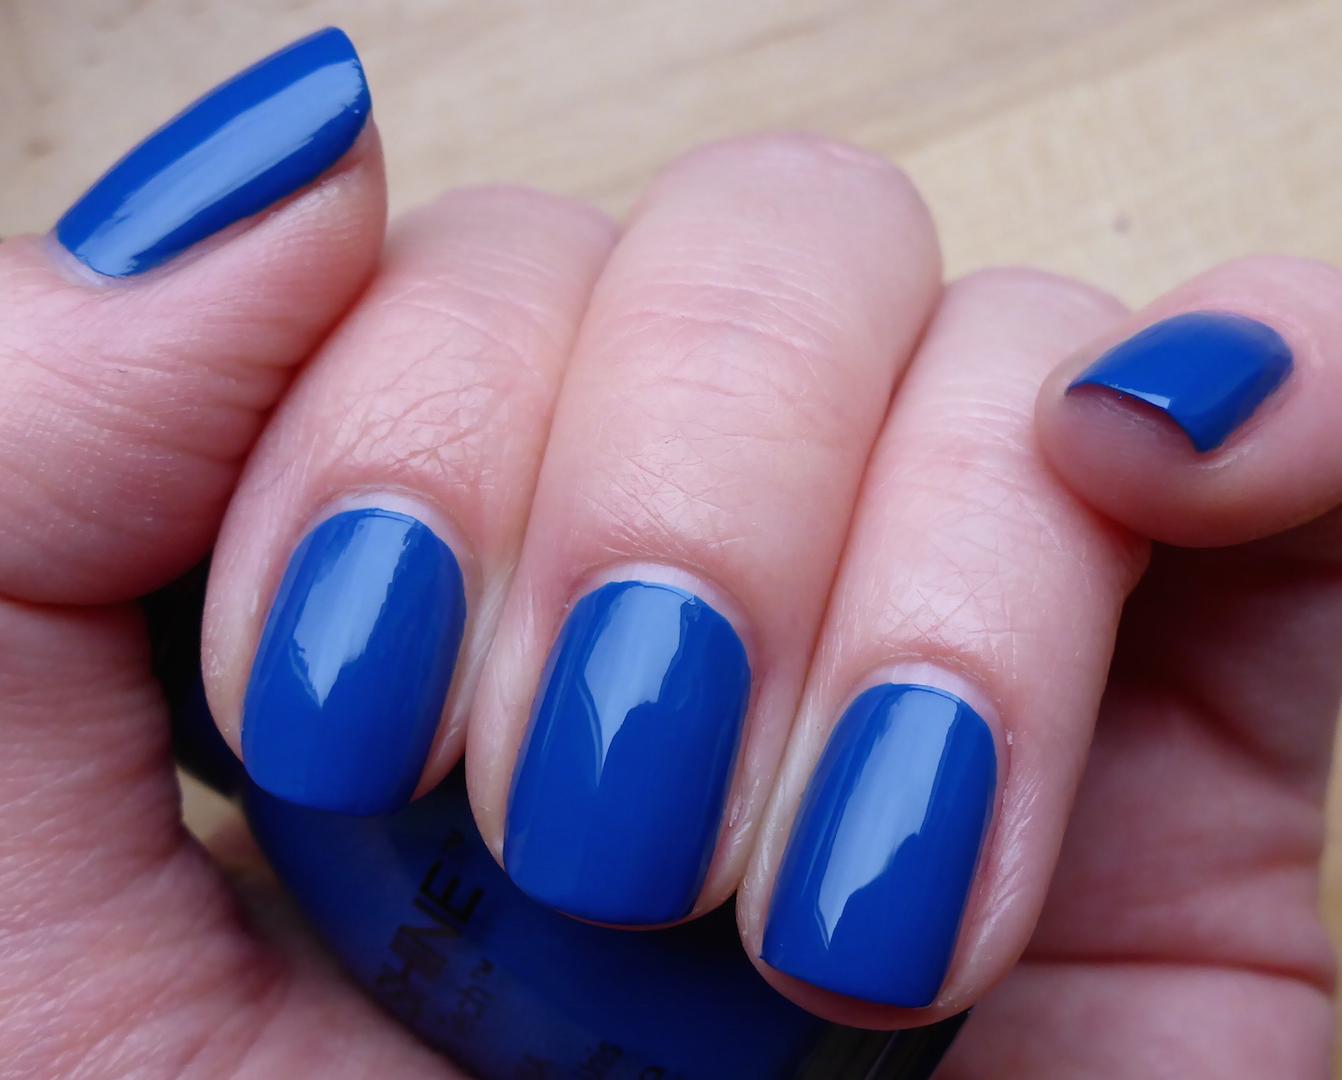 http://marzipany.blogspot.de/2015/01/lacke-in-farbe-und-bunt-sinful-shine.html